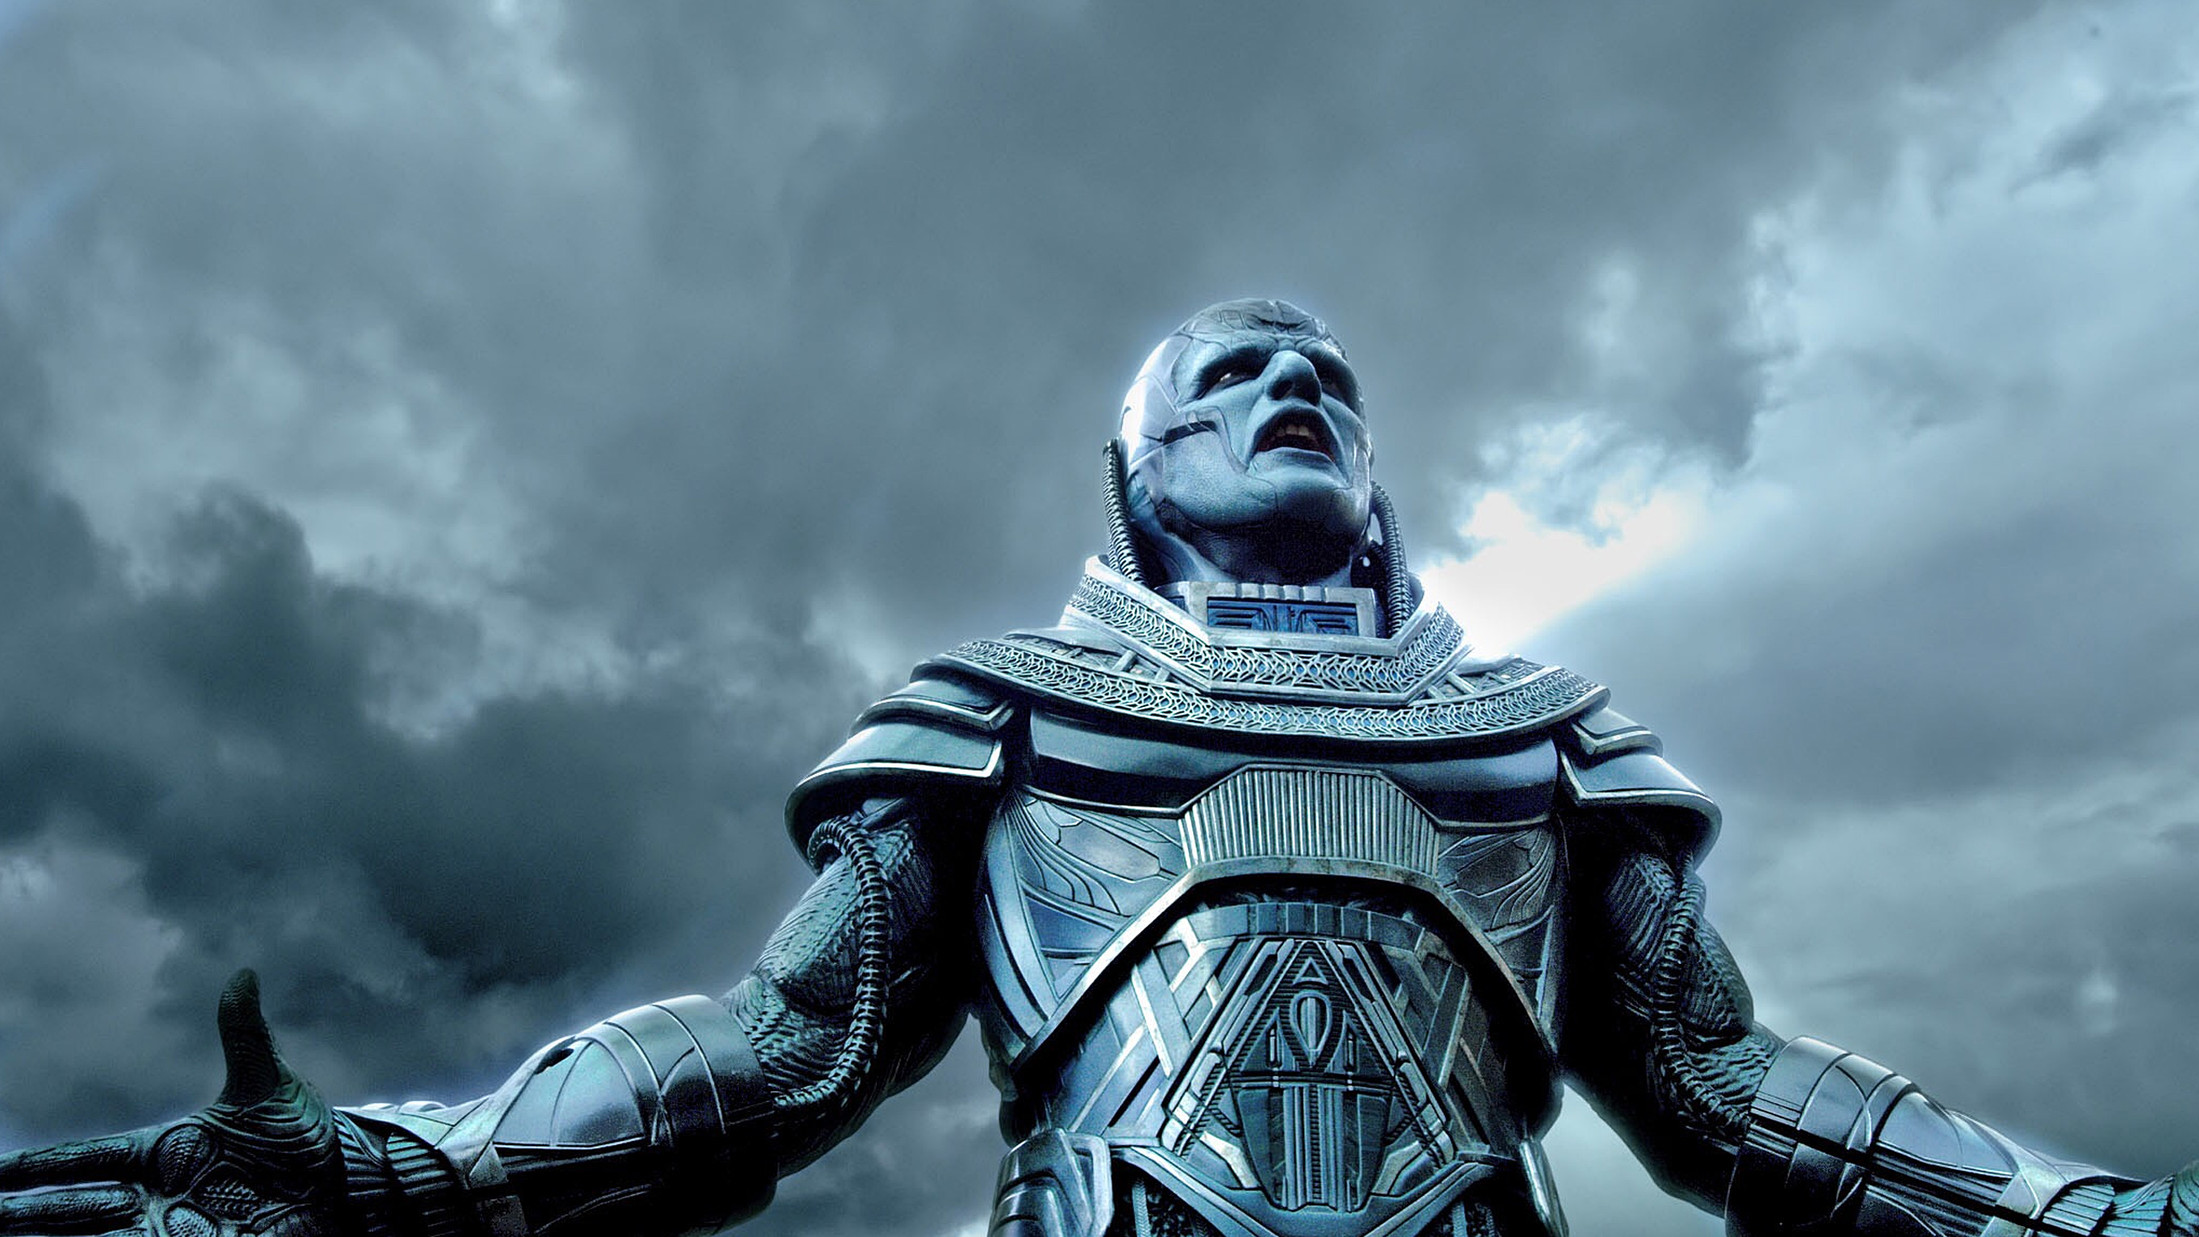 X Men Apocalypse Hd Wallpaper Background Image 2199x1237 Id